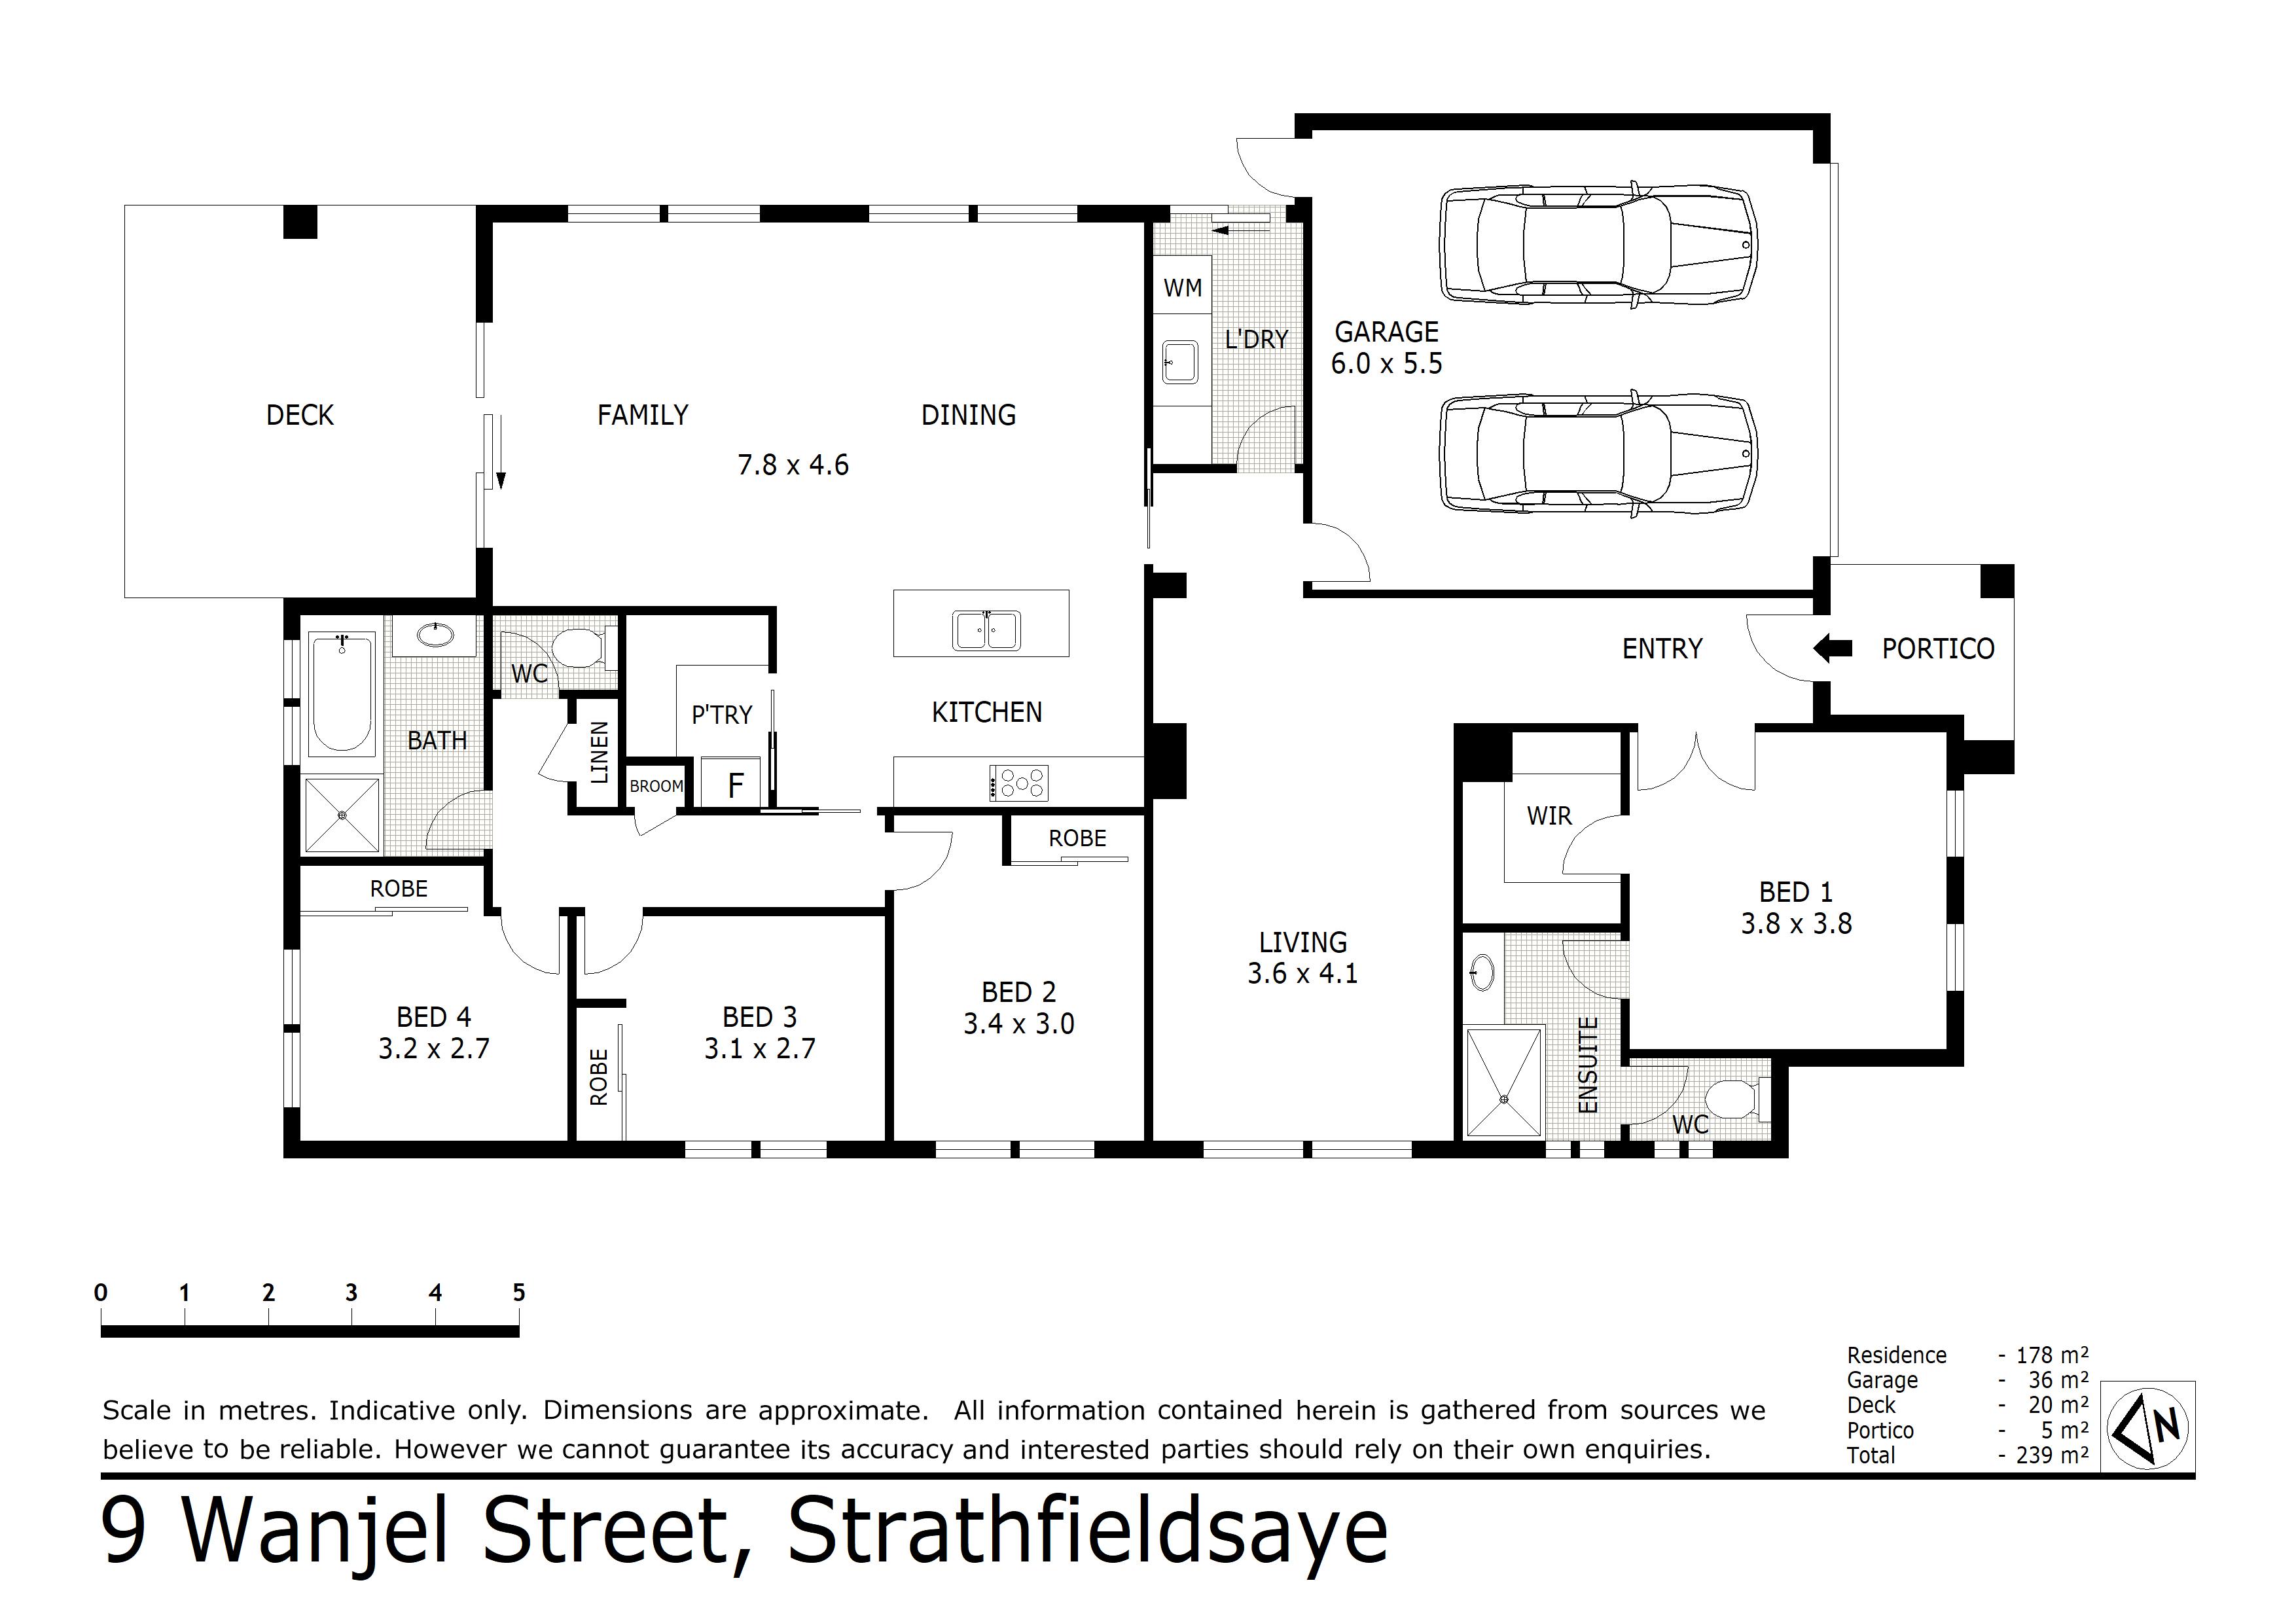 9 Wanjel Street, Strathfieldsaye, VIC 3551